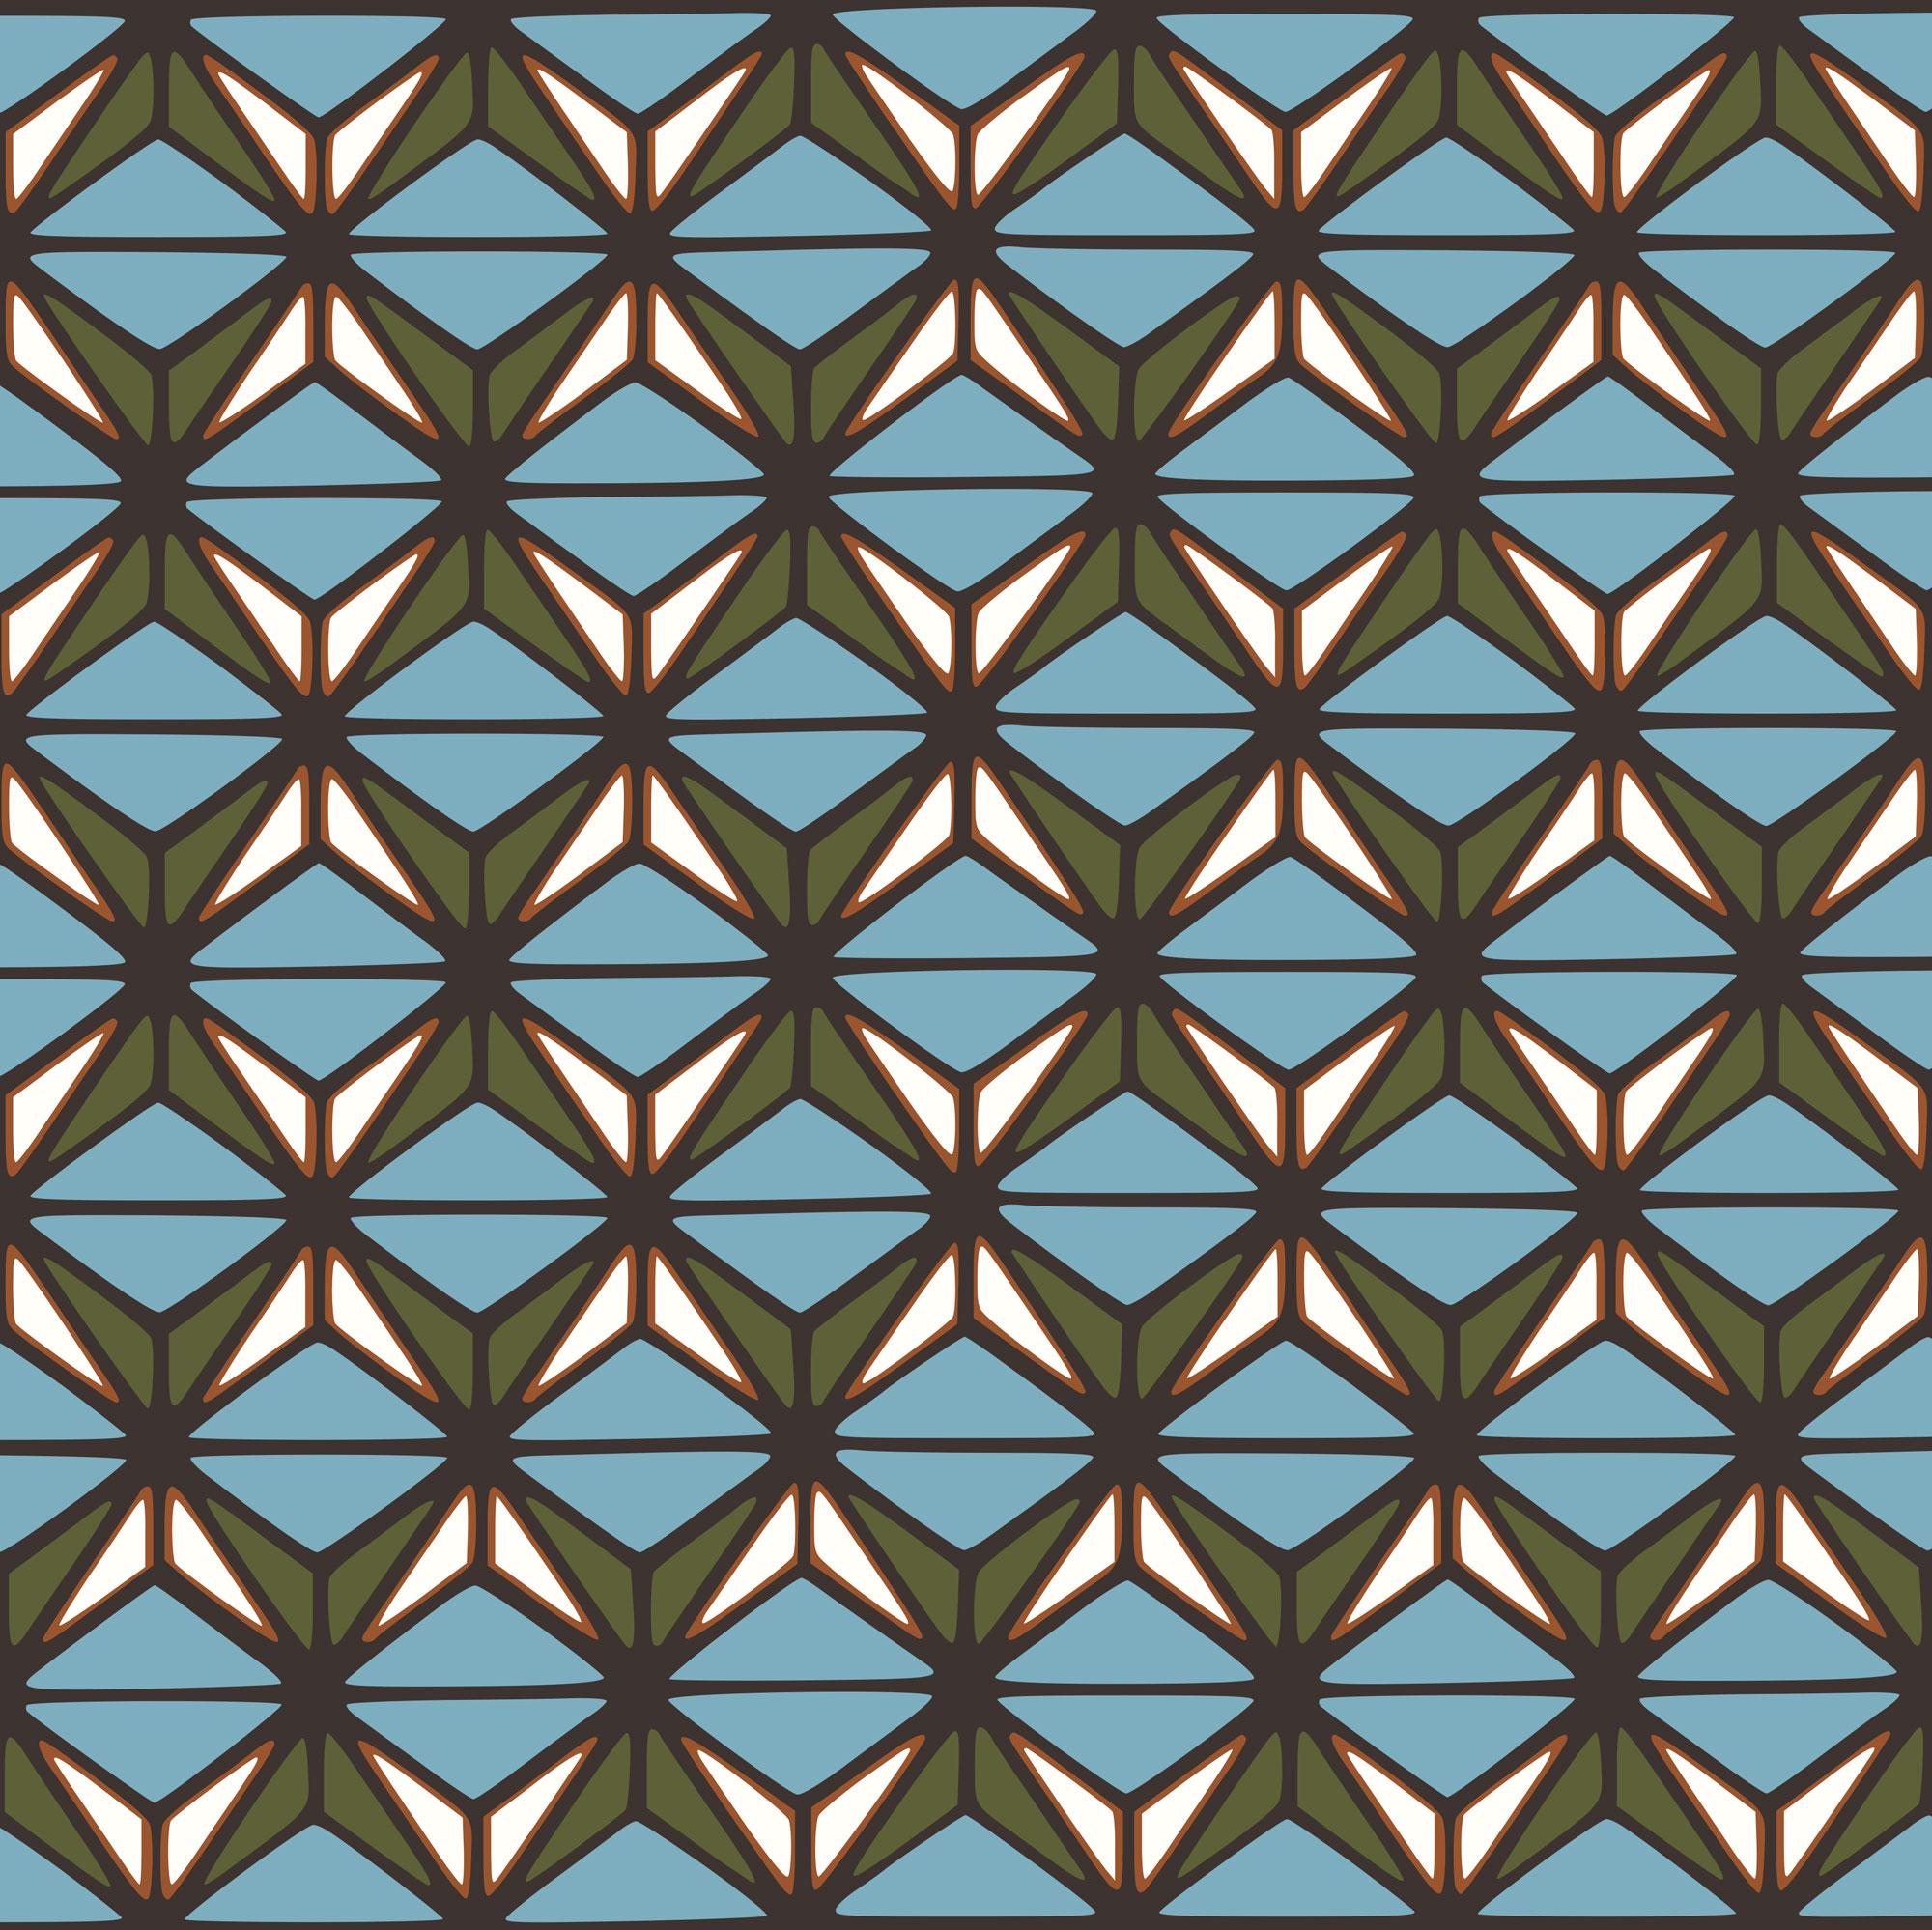 triangles4.jpg